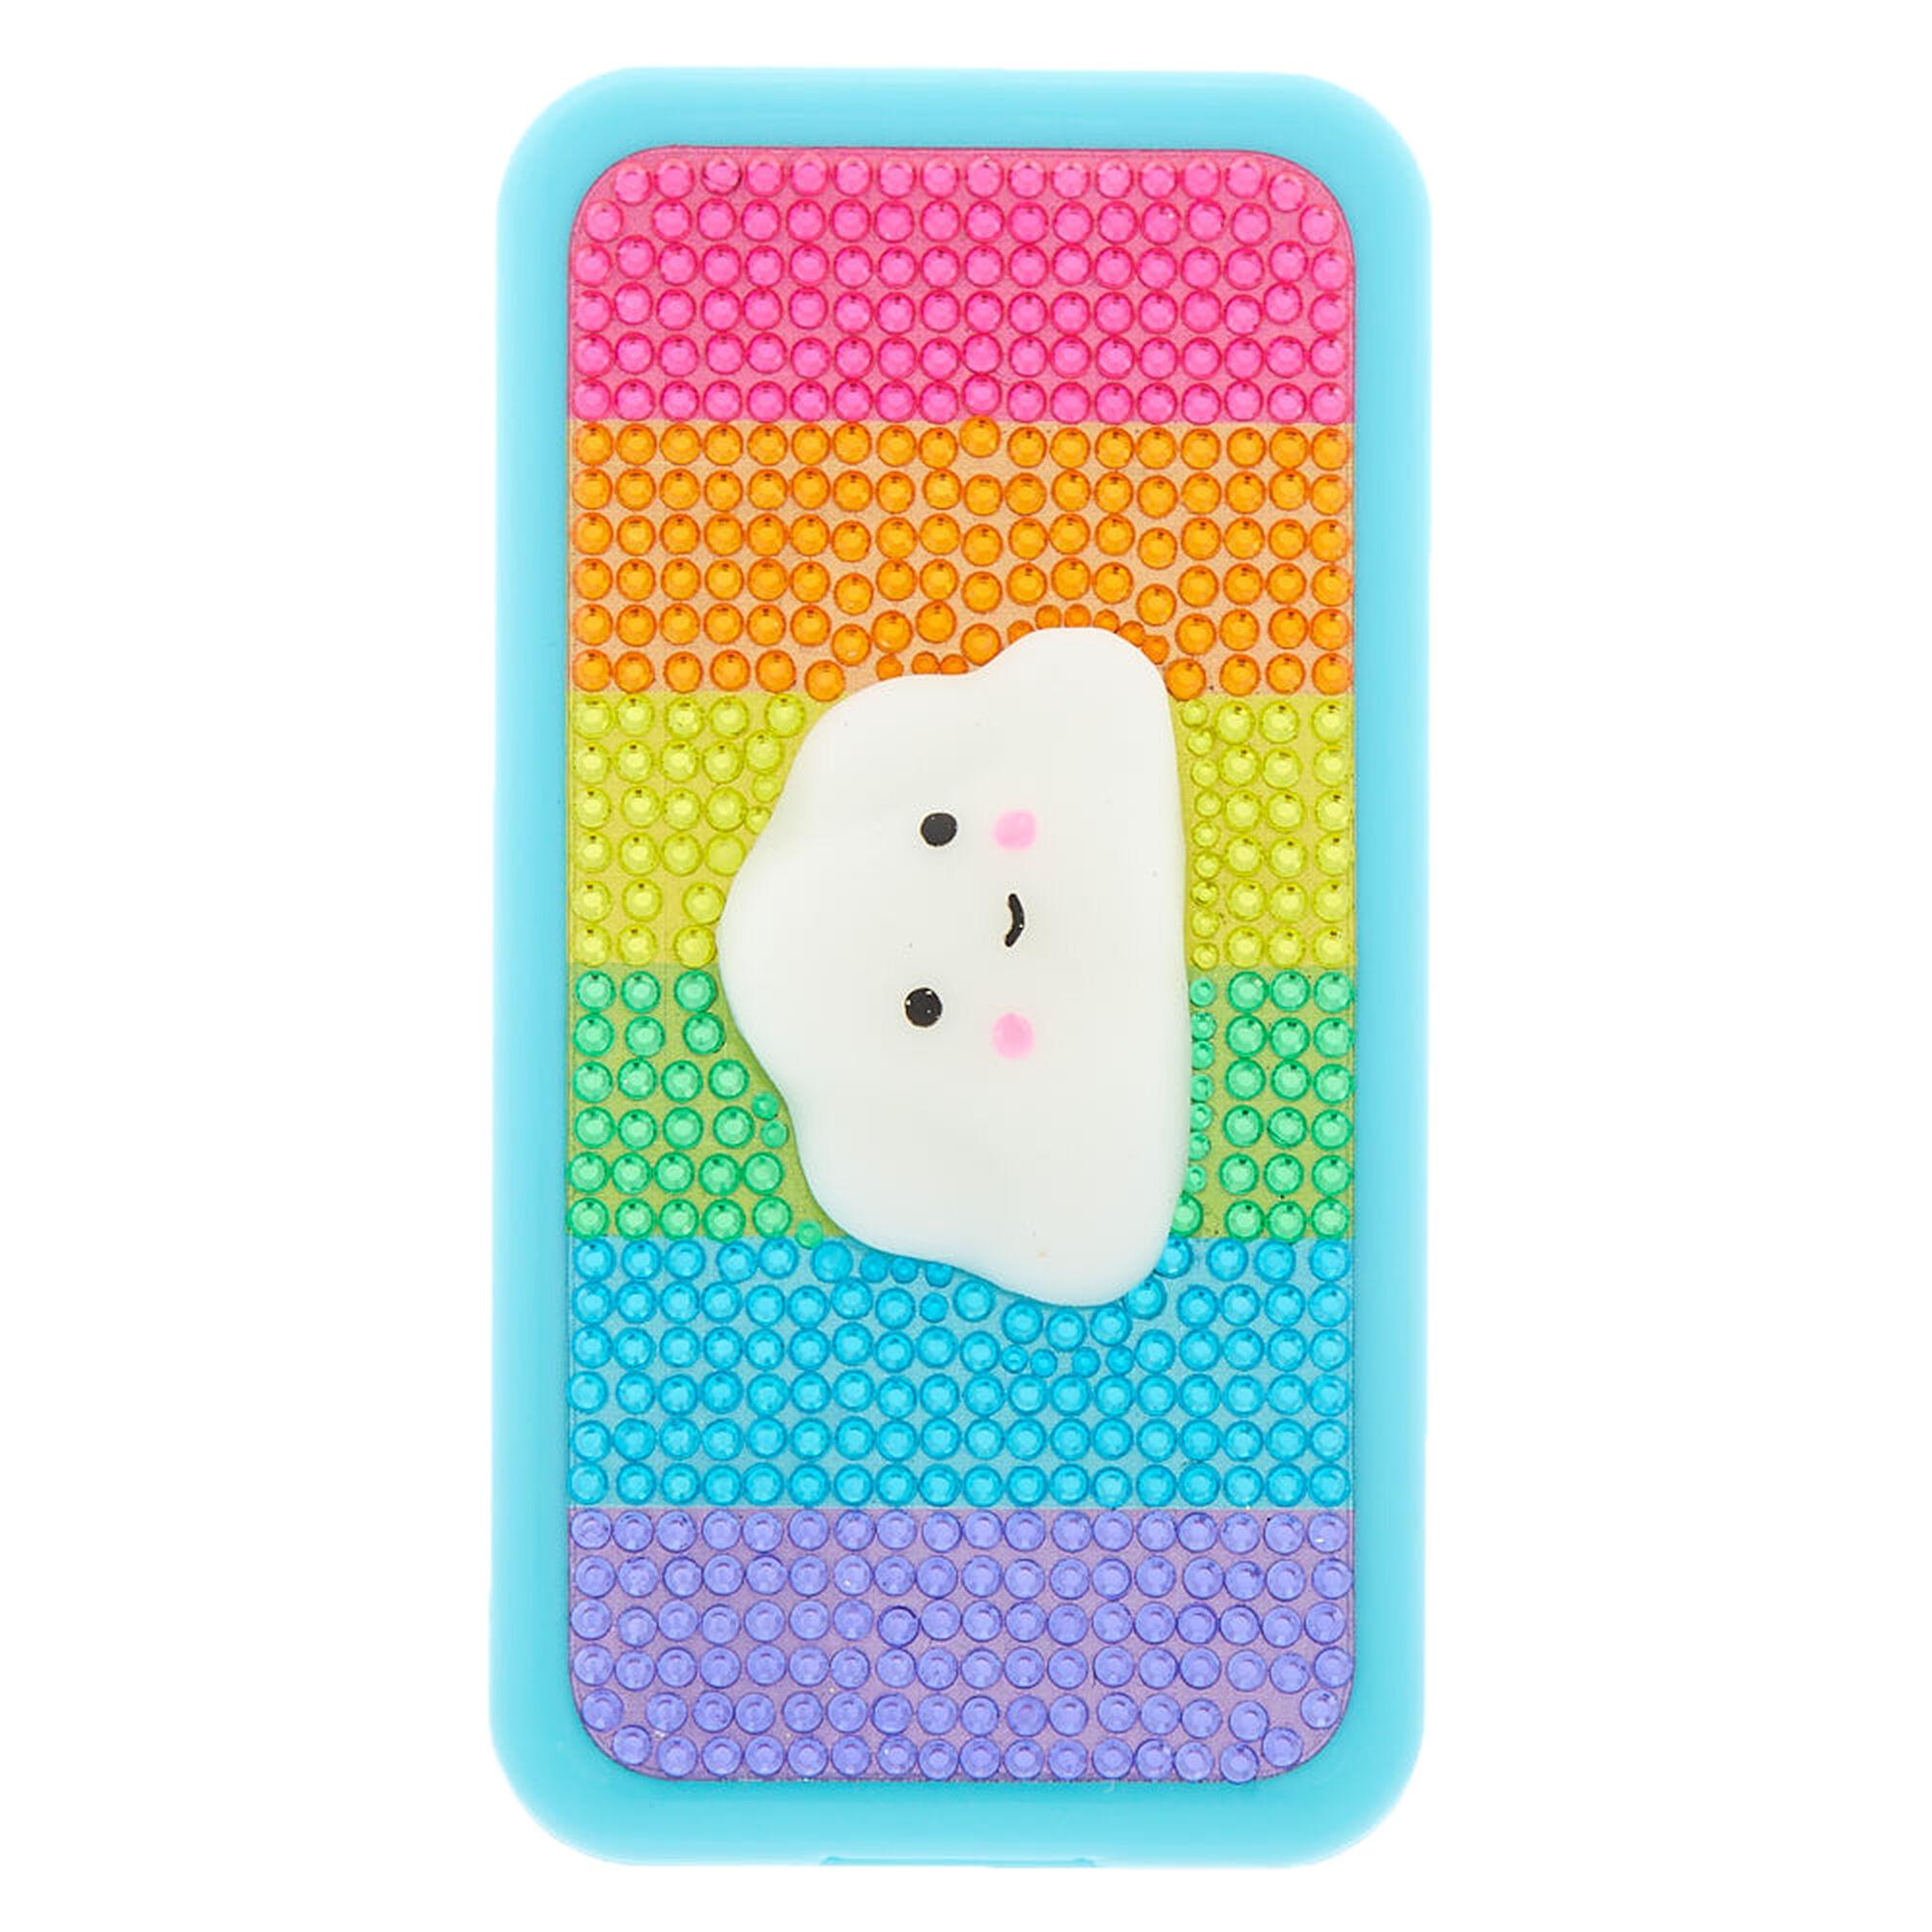 12d5103e6040ed Rainbow Cloud Cell Phone Bling Makeup Set - Turquoise | Claire's